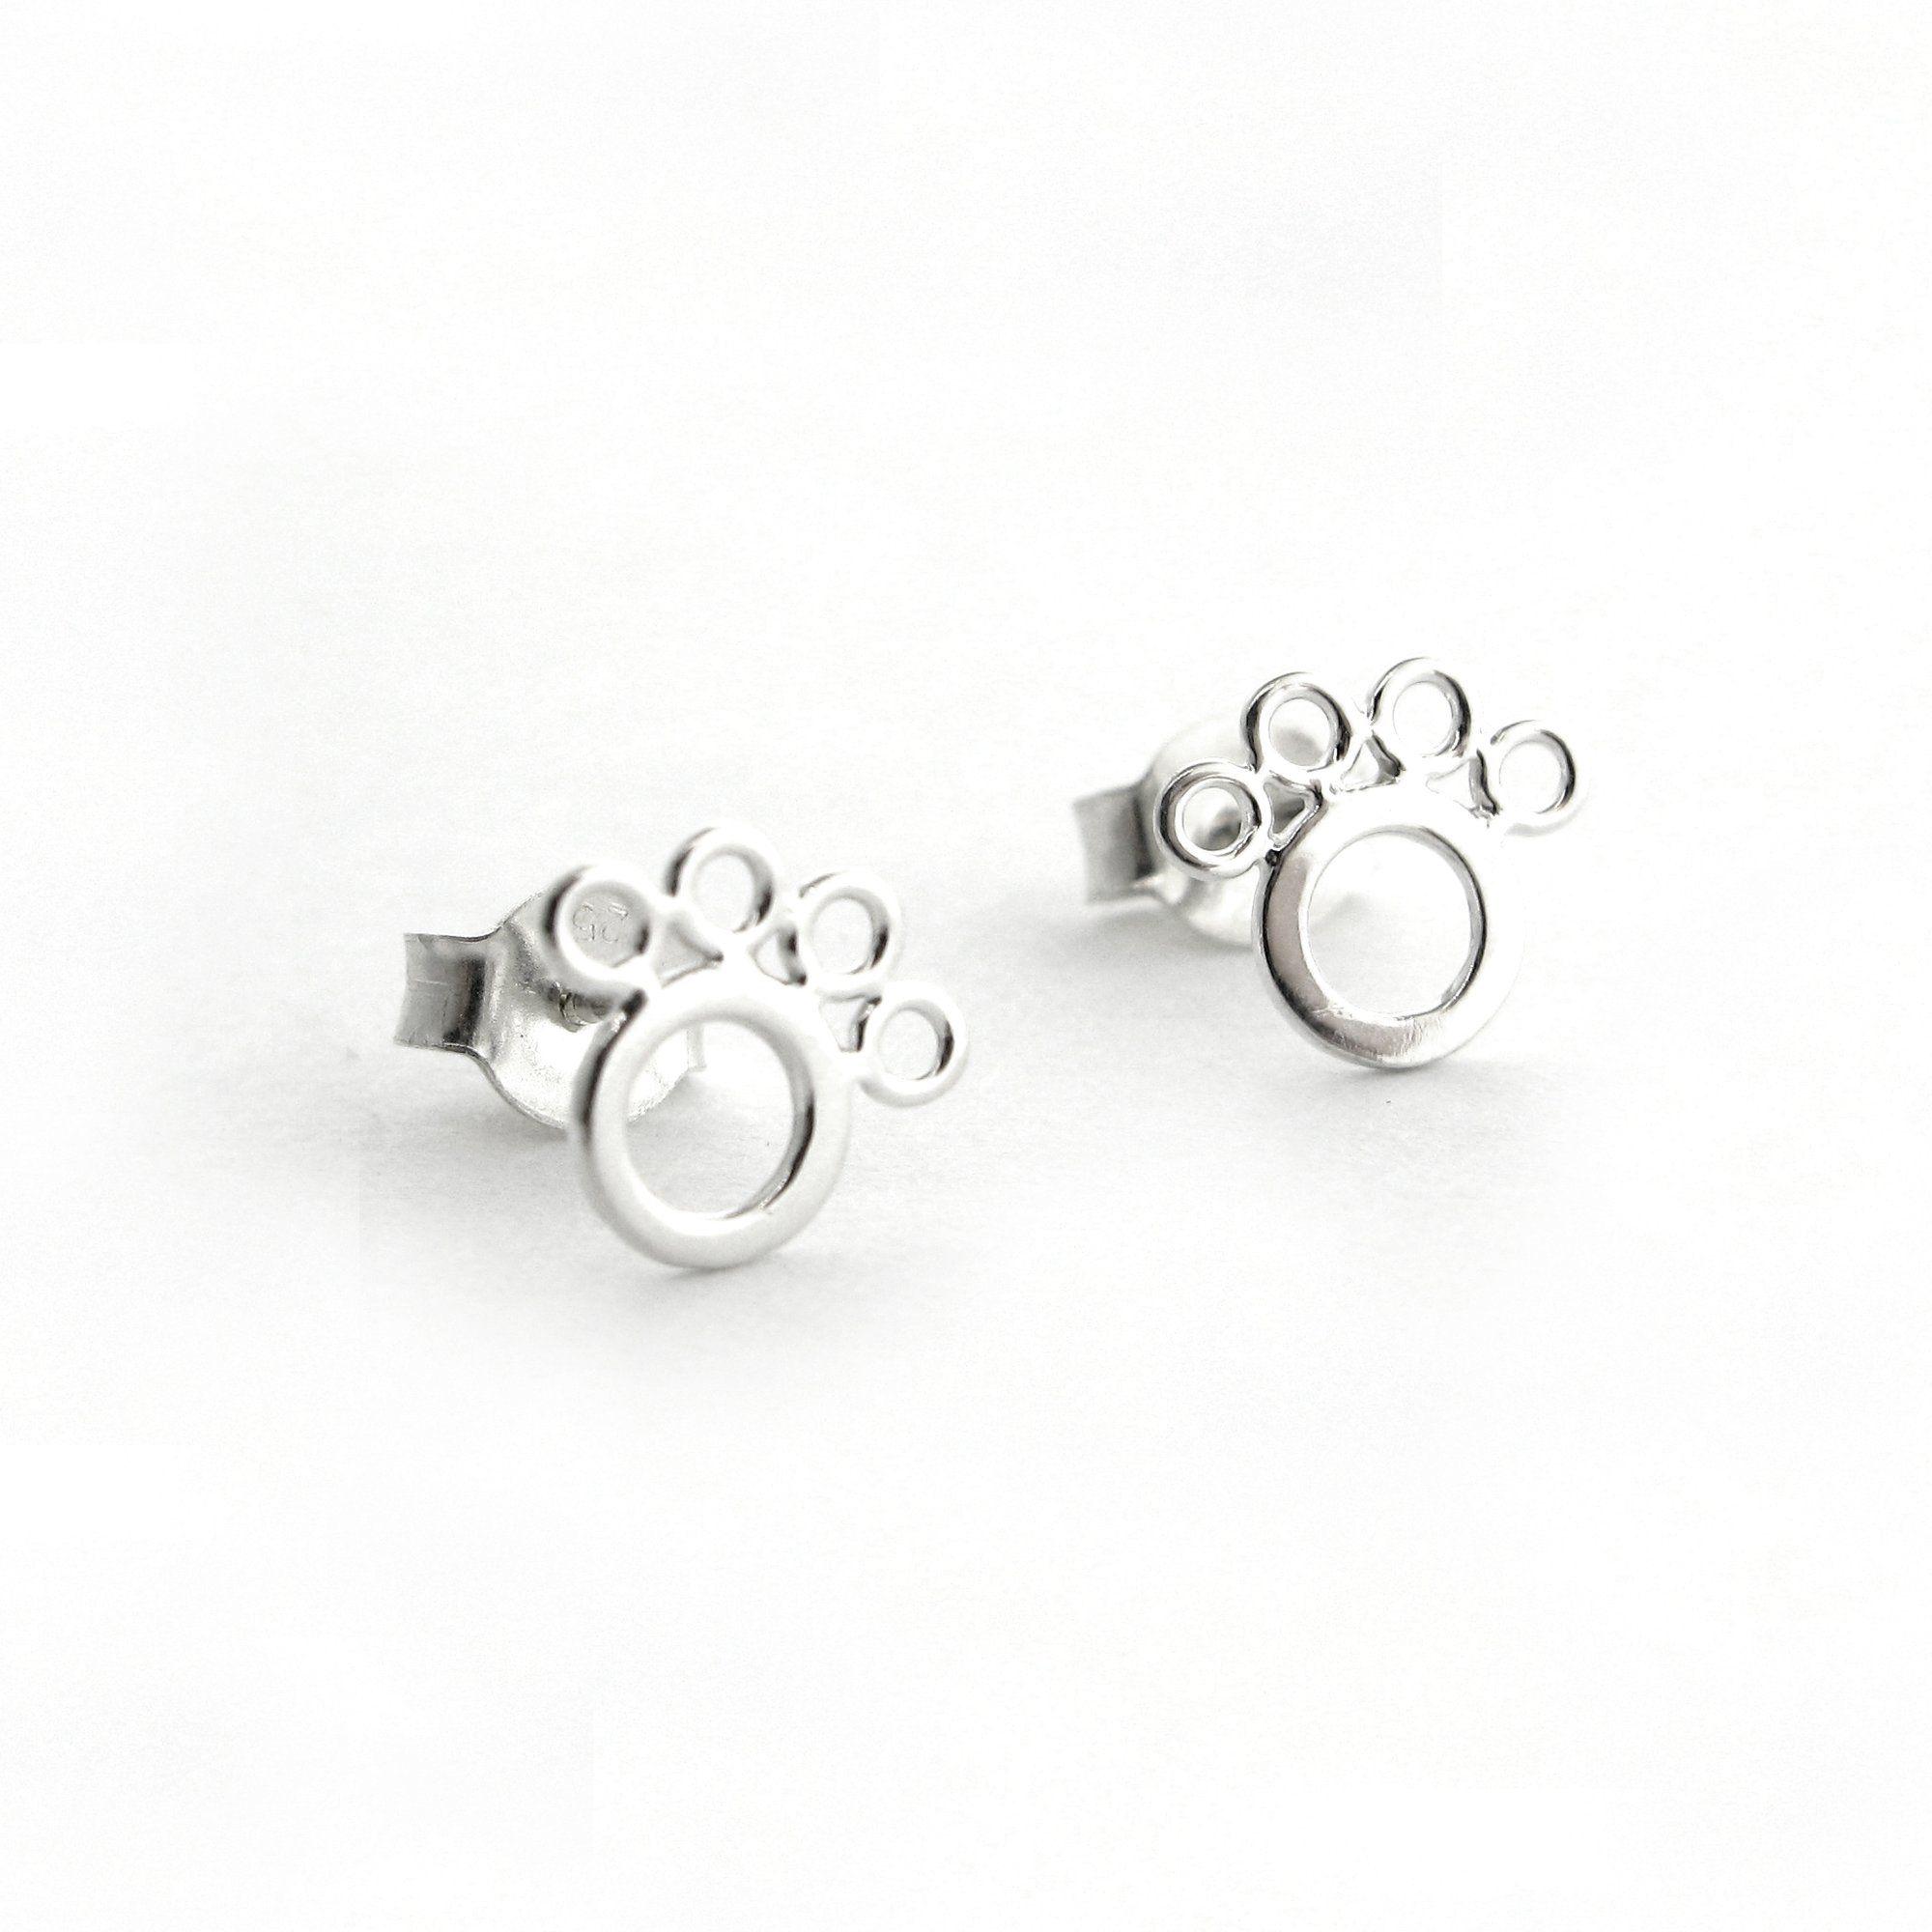 Open Paw Print Earrings Paw print earrings, Paw print